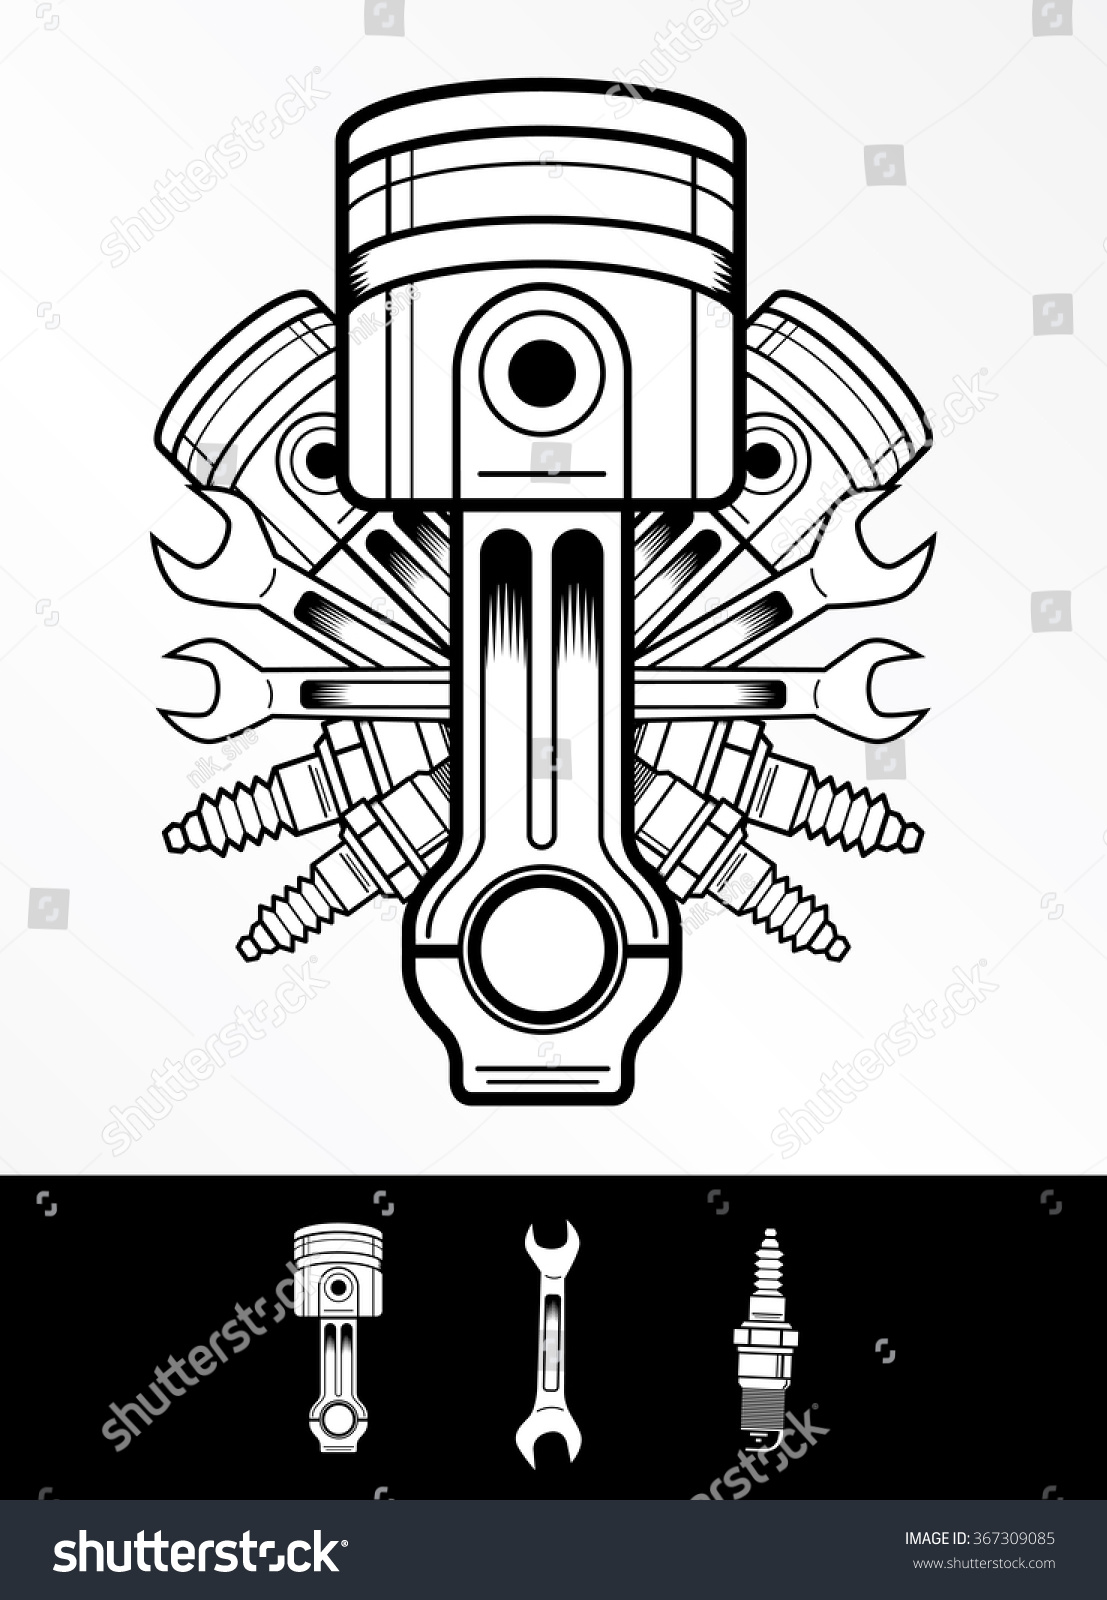 Royalty-free Piston vector logo in retro style #367309085 ...